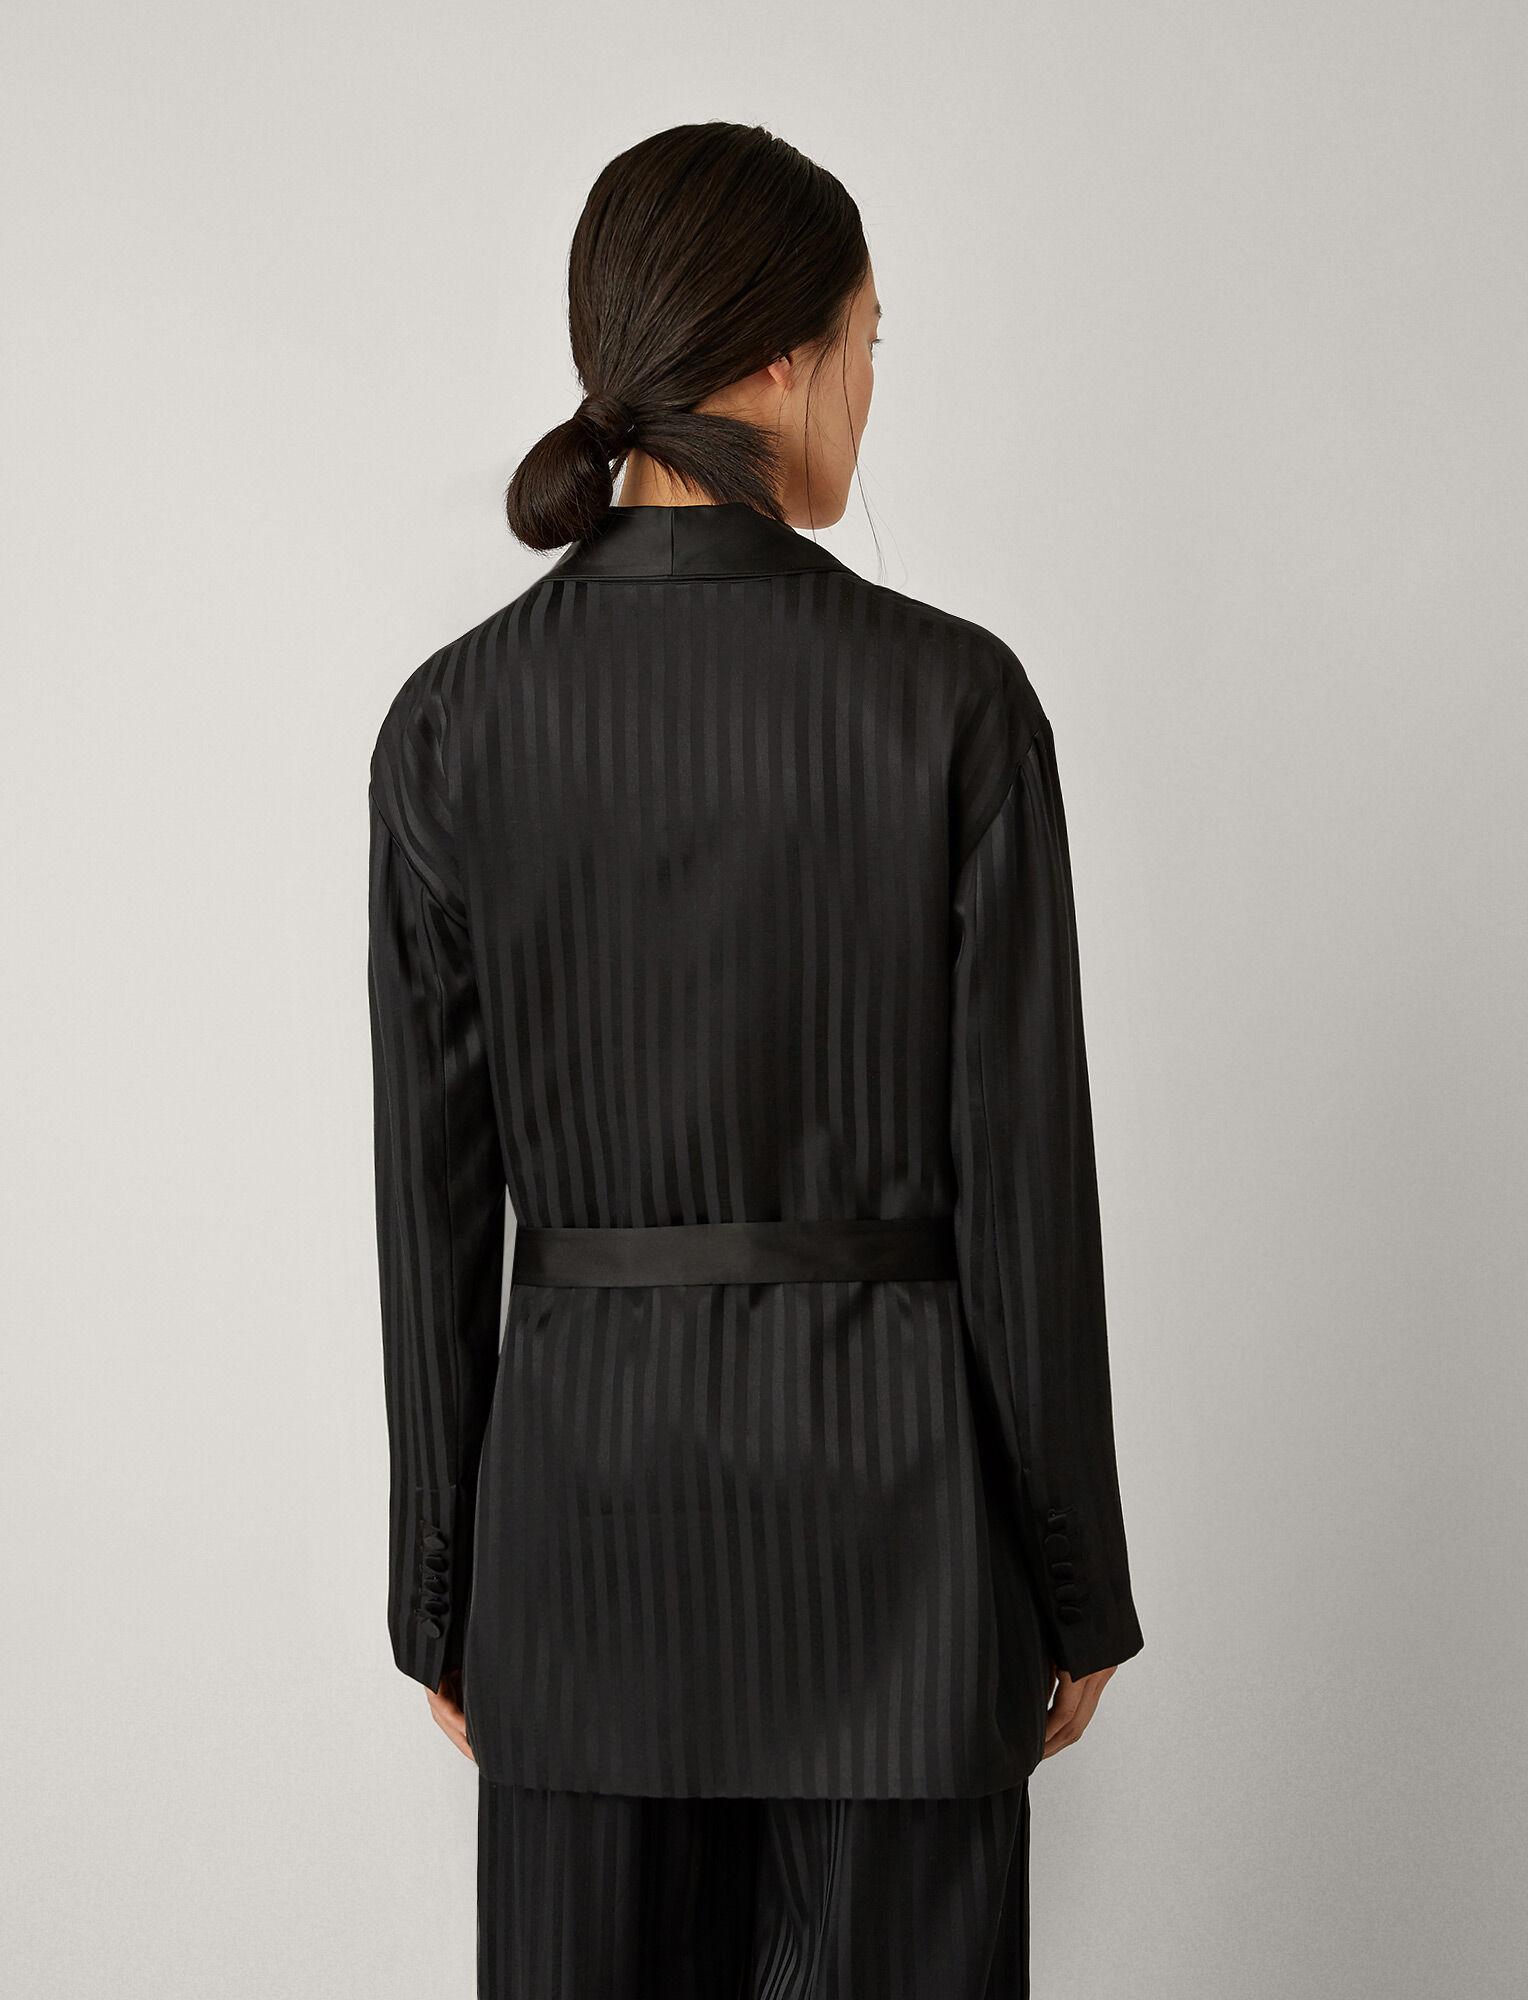 Joseph, Nash Pyjama Silk Jacquard Jacket, in BLACK